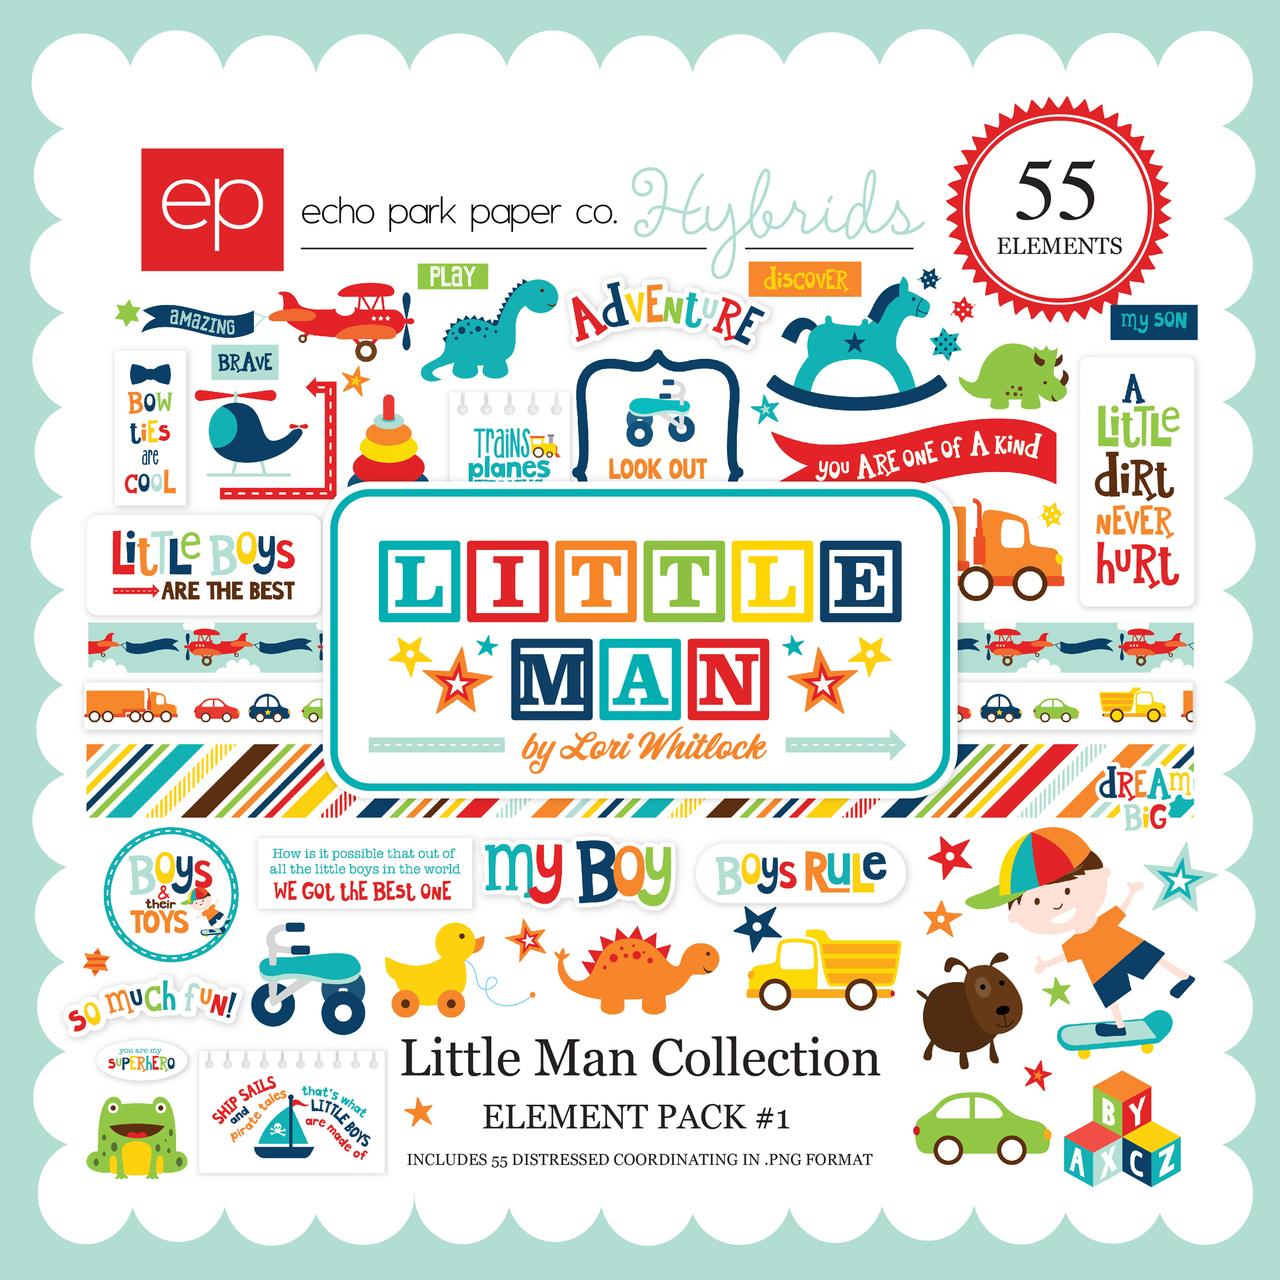 Little Man Element Pack 1